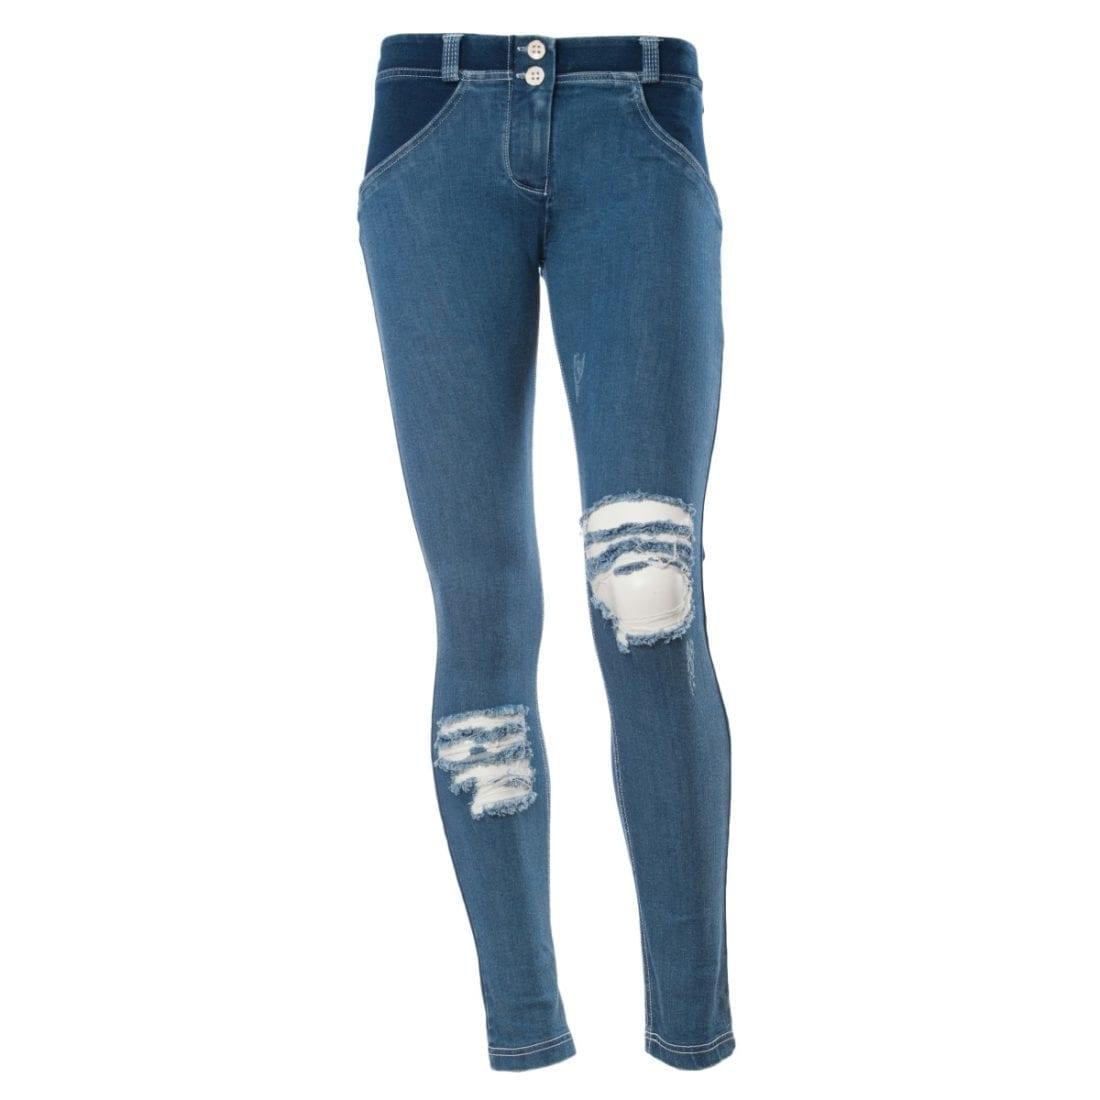 FREDDY WR.UP Shaping Effect Low waist-Skinny Denim Jersey true distressed denim front -WRUP1GLJ4E